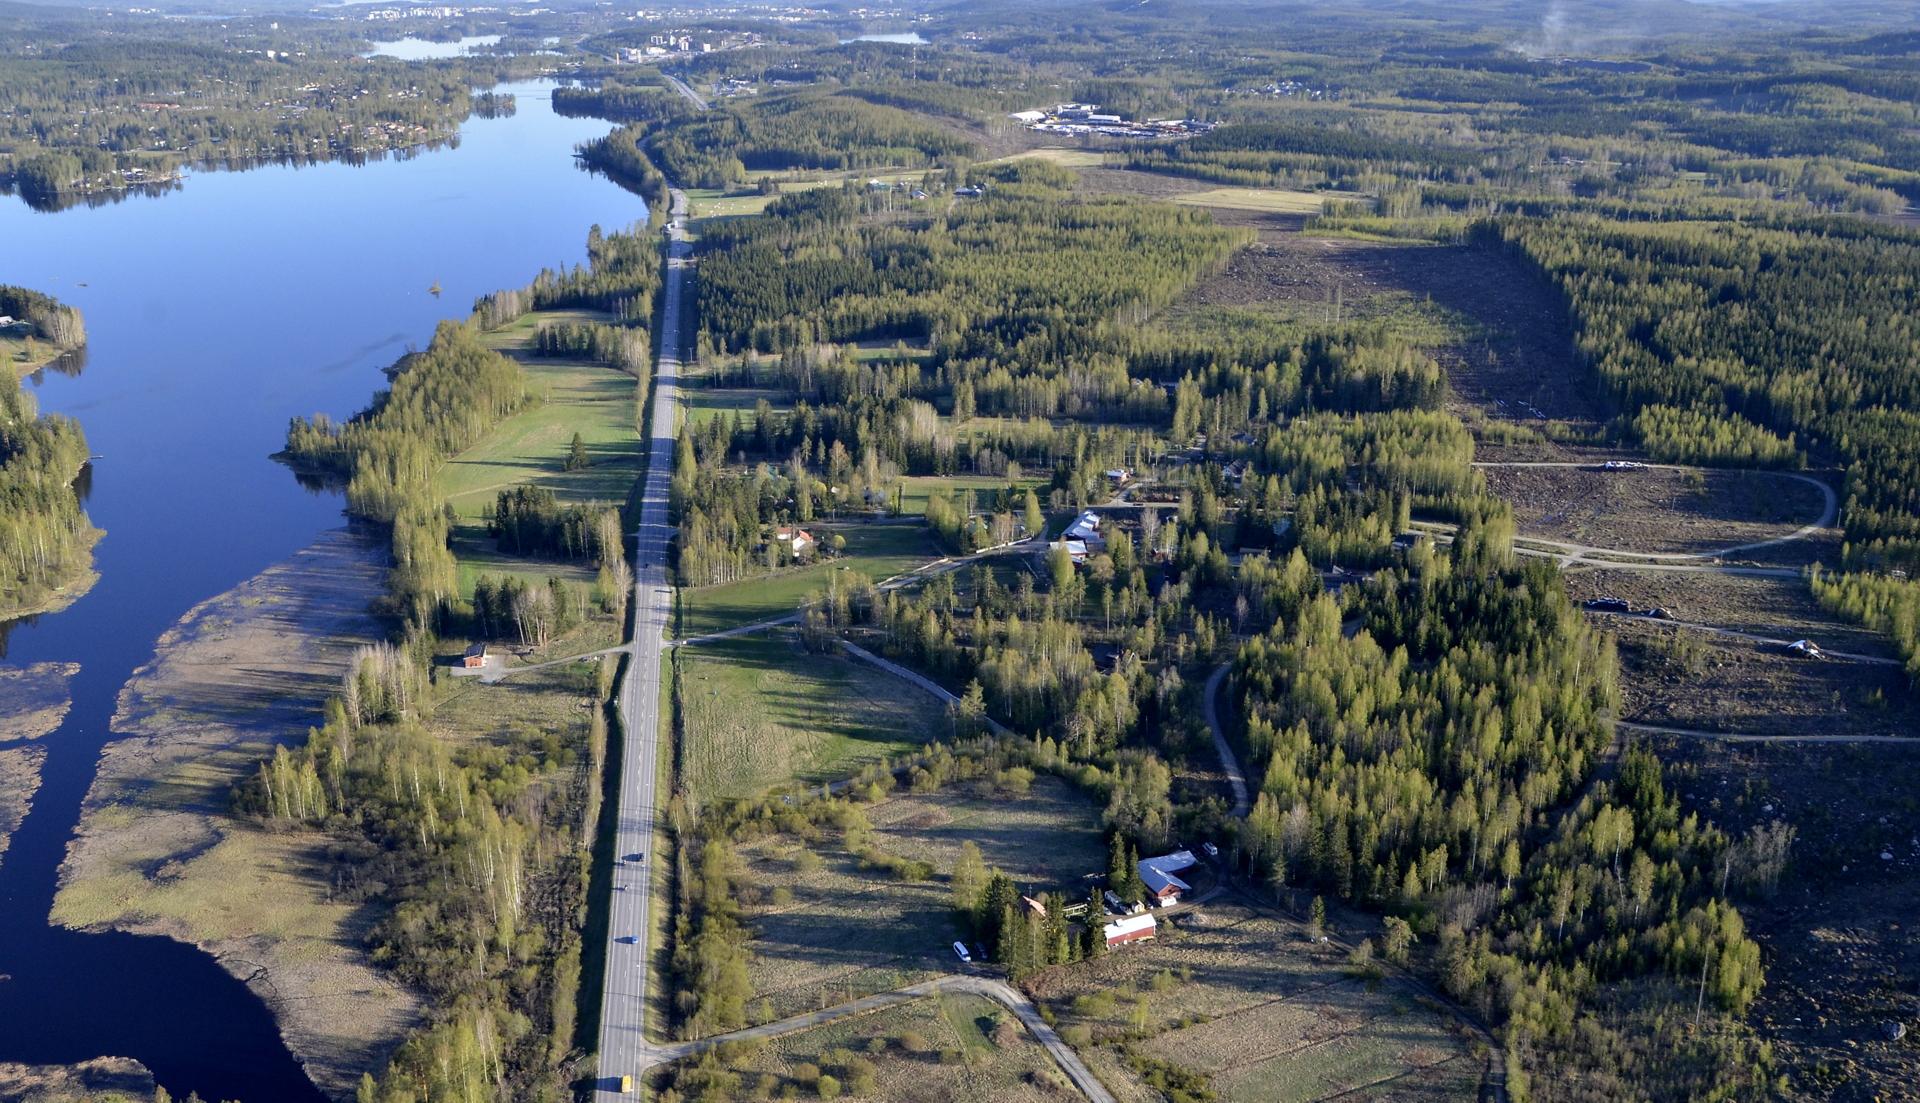 Sakarinmäki asutusalue., Alvajärvi vasemmalla.